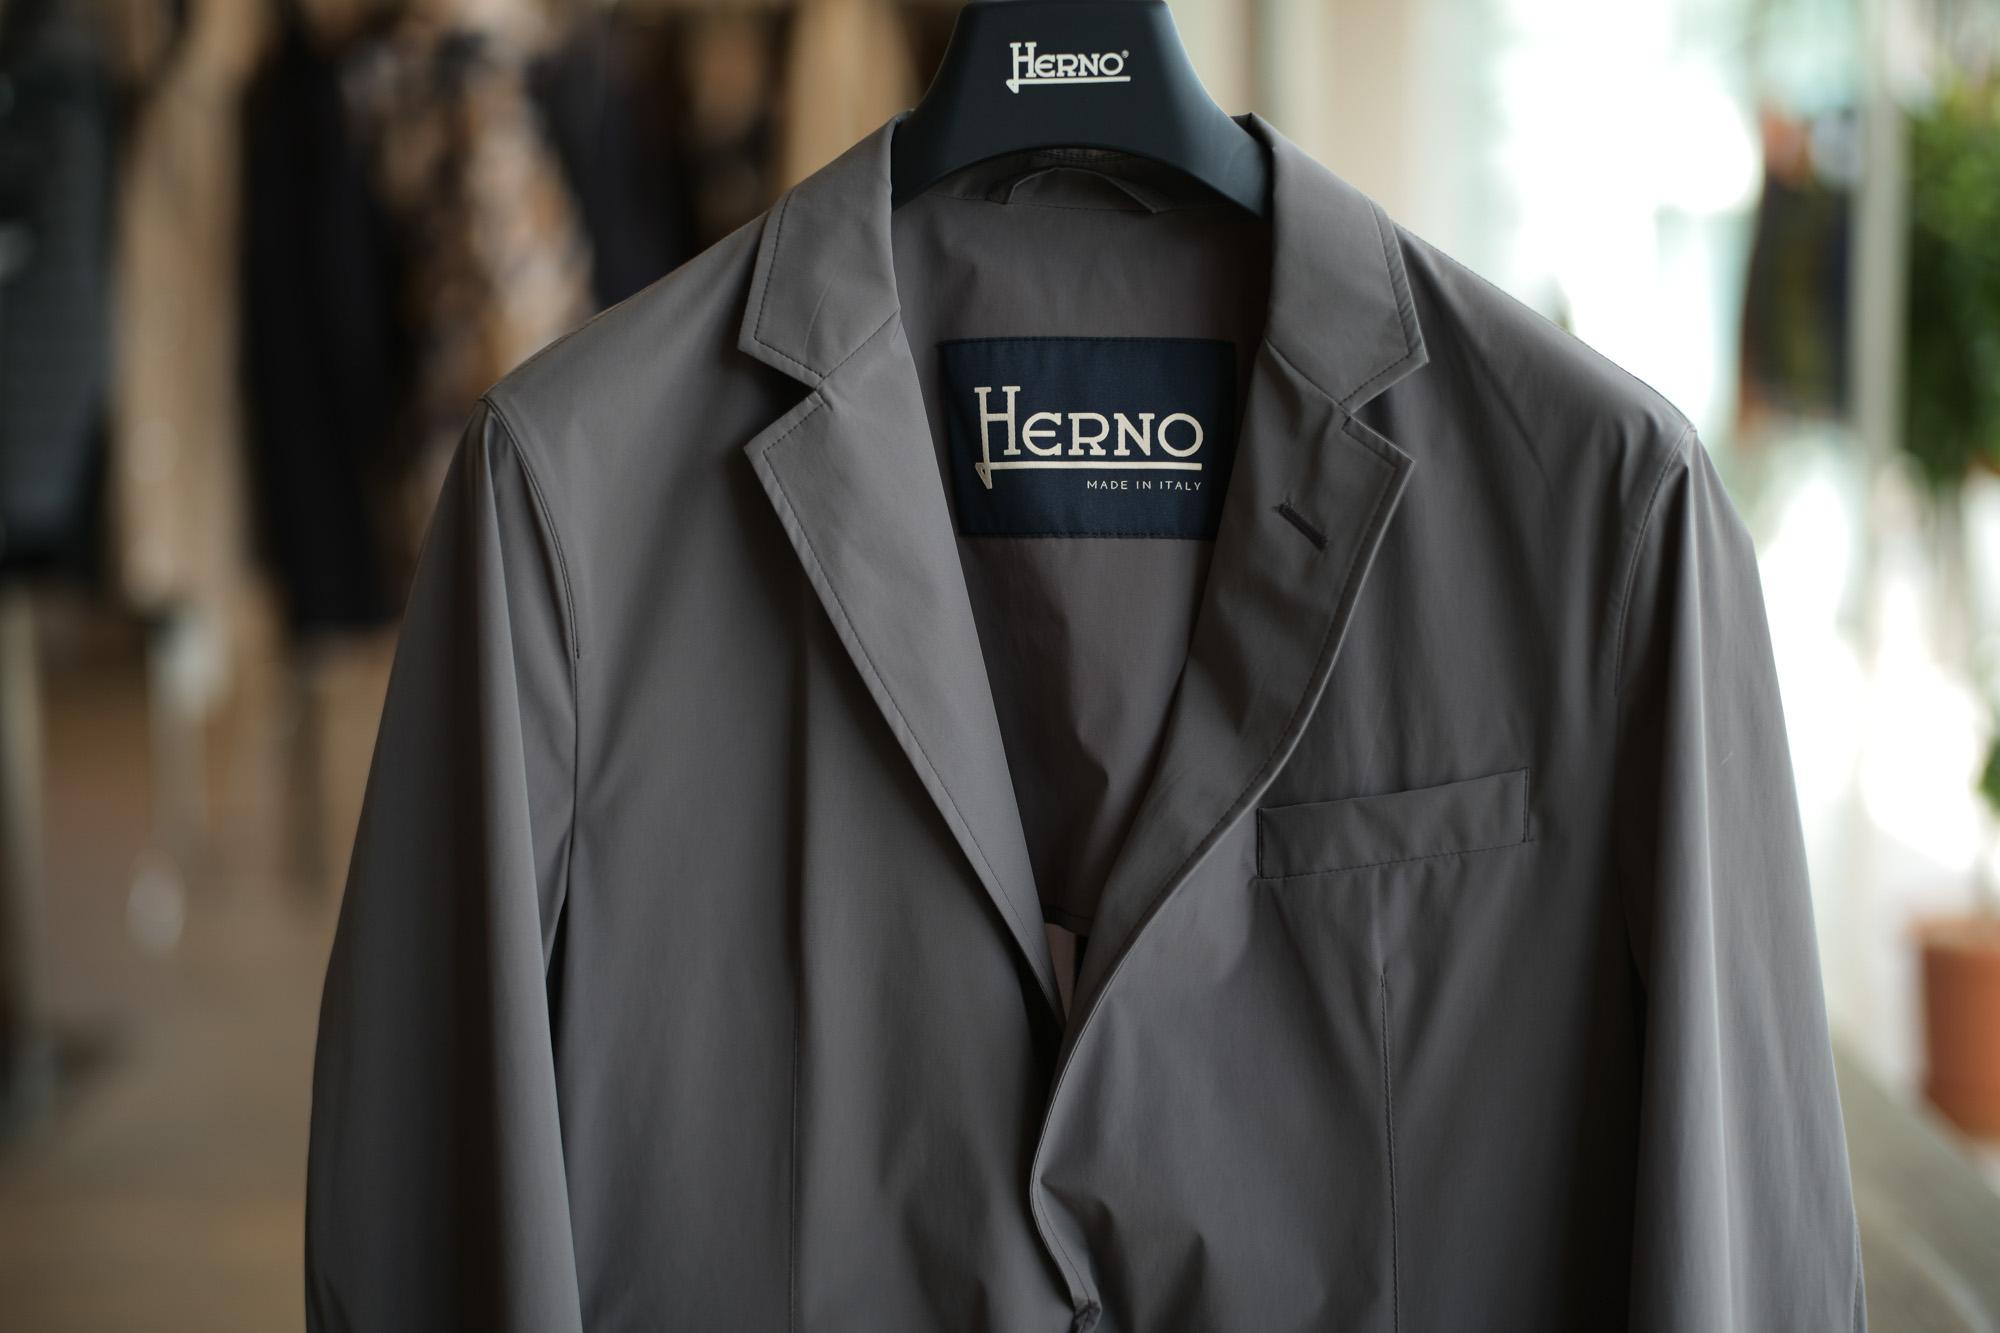 HERNO / ヘルノ (2018 春夏 展示会)  herno ヘルノ 愛知 名古屋 Alto e Diritto アルト エ デリット ラミナー シェル コート ジャケット トレンチコート ダウンベスト  PC0039U GA0069U GA008UL GI028UL IM0127U